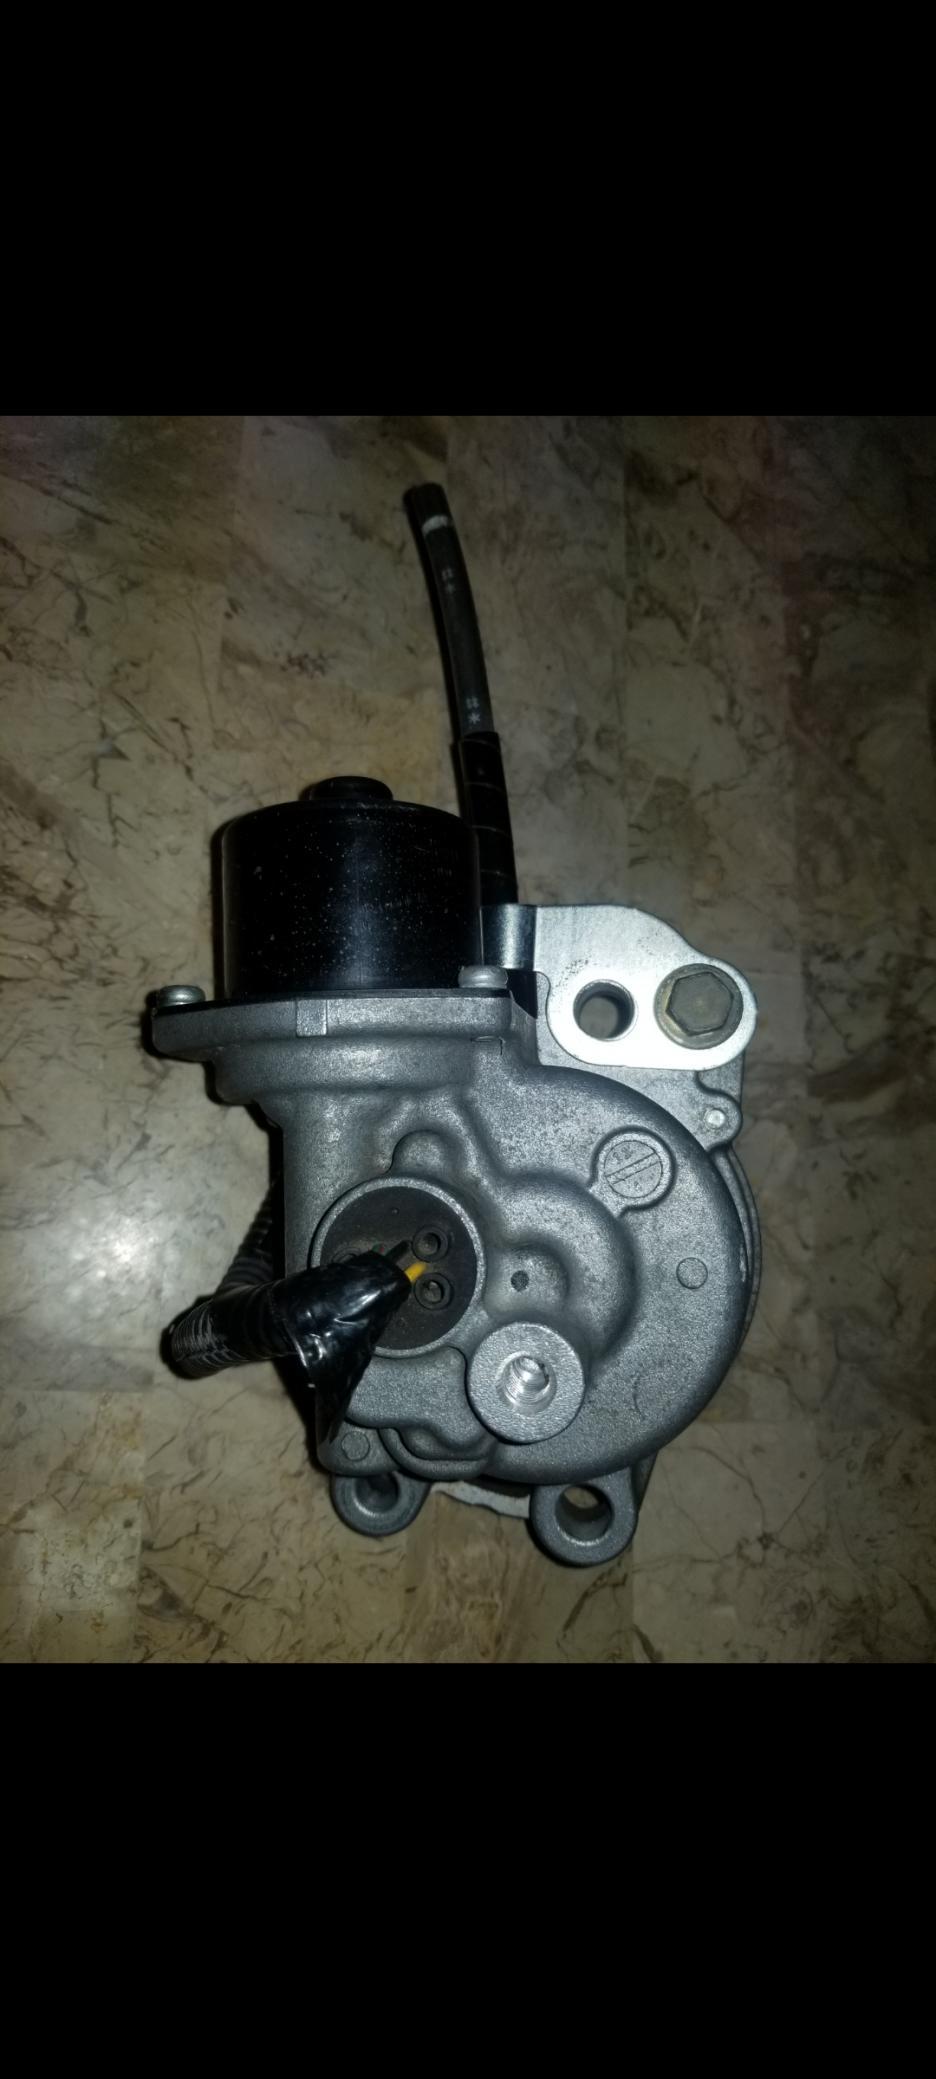 "FS: 5th gen 4R & FJ 8.2"" elocker motor/actuator-screenshot_20210709-090923_gallery-jpg"